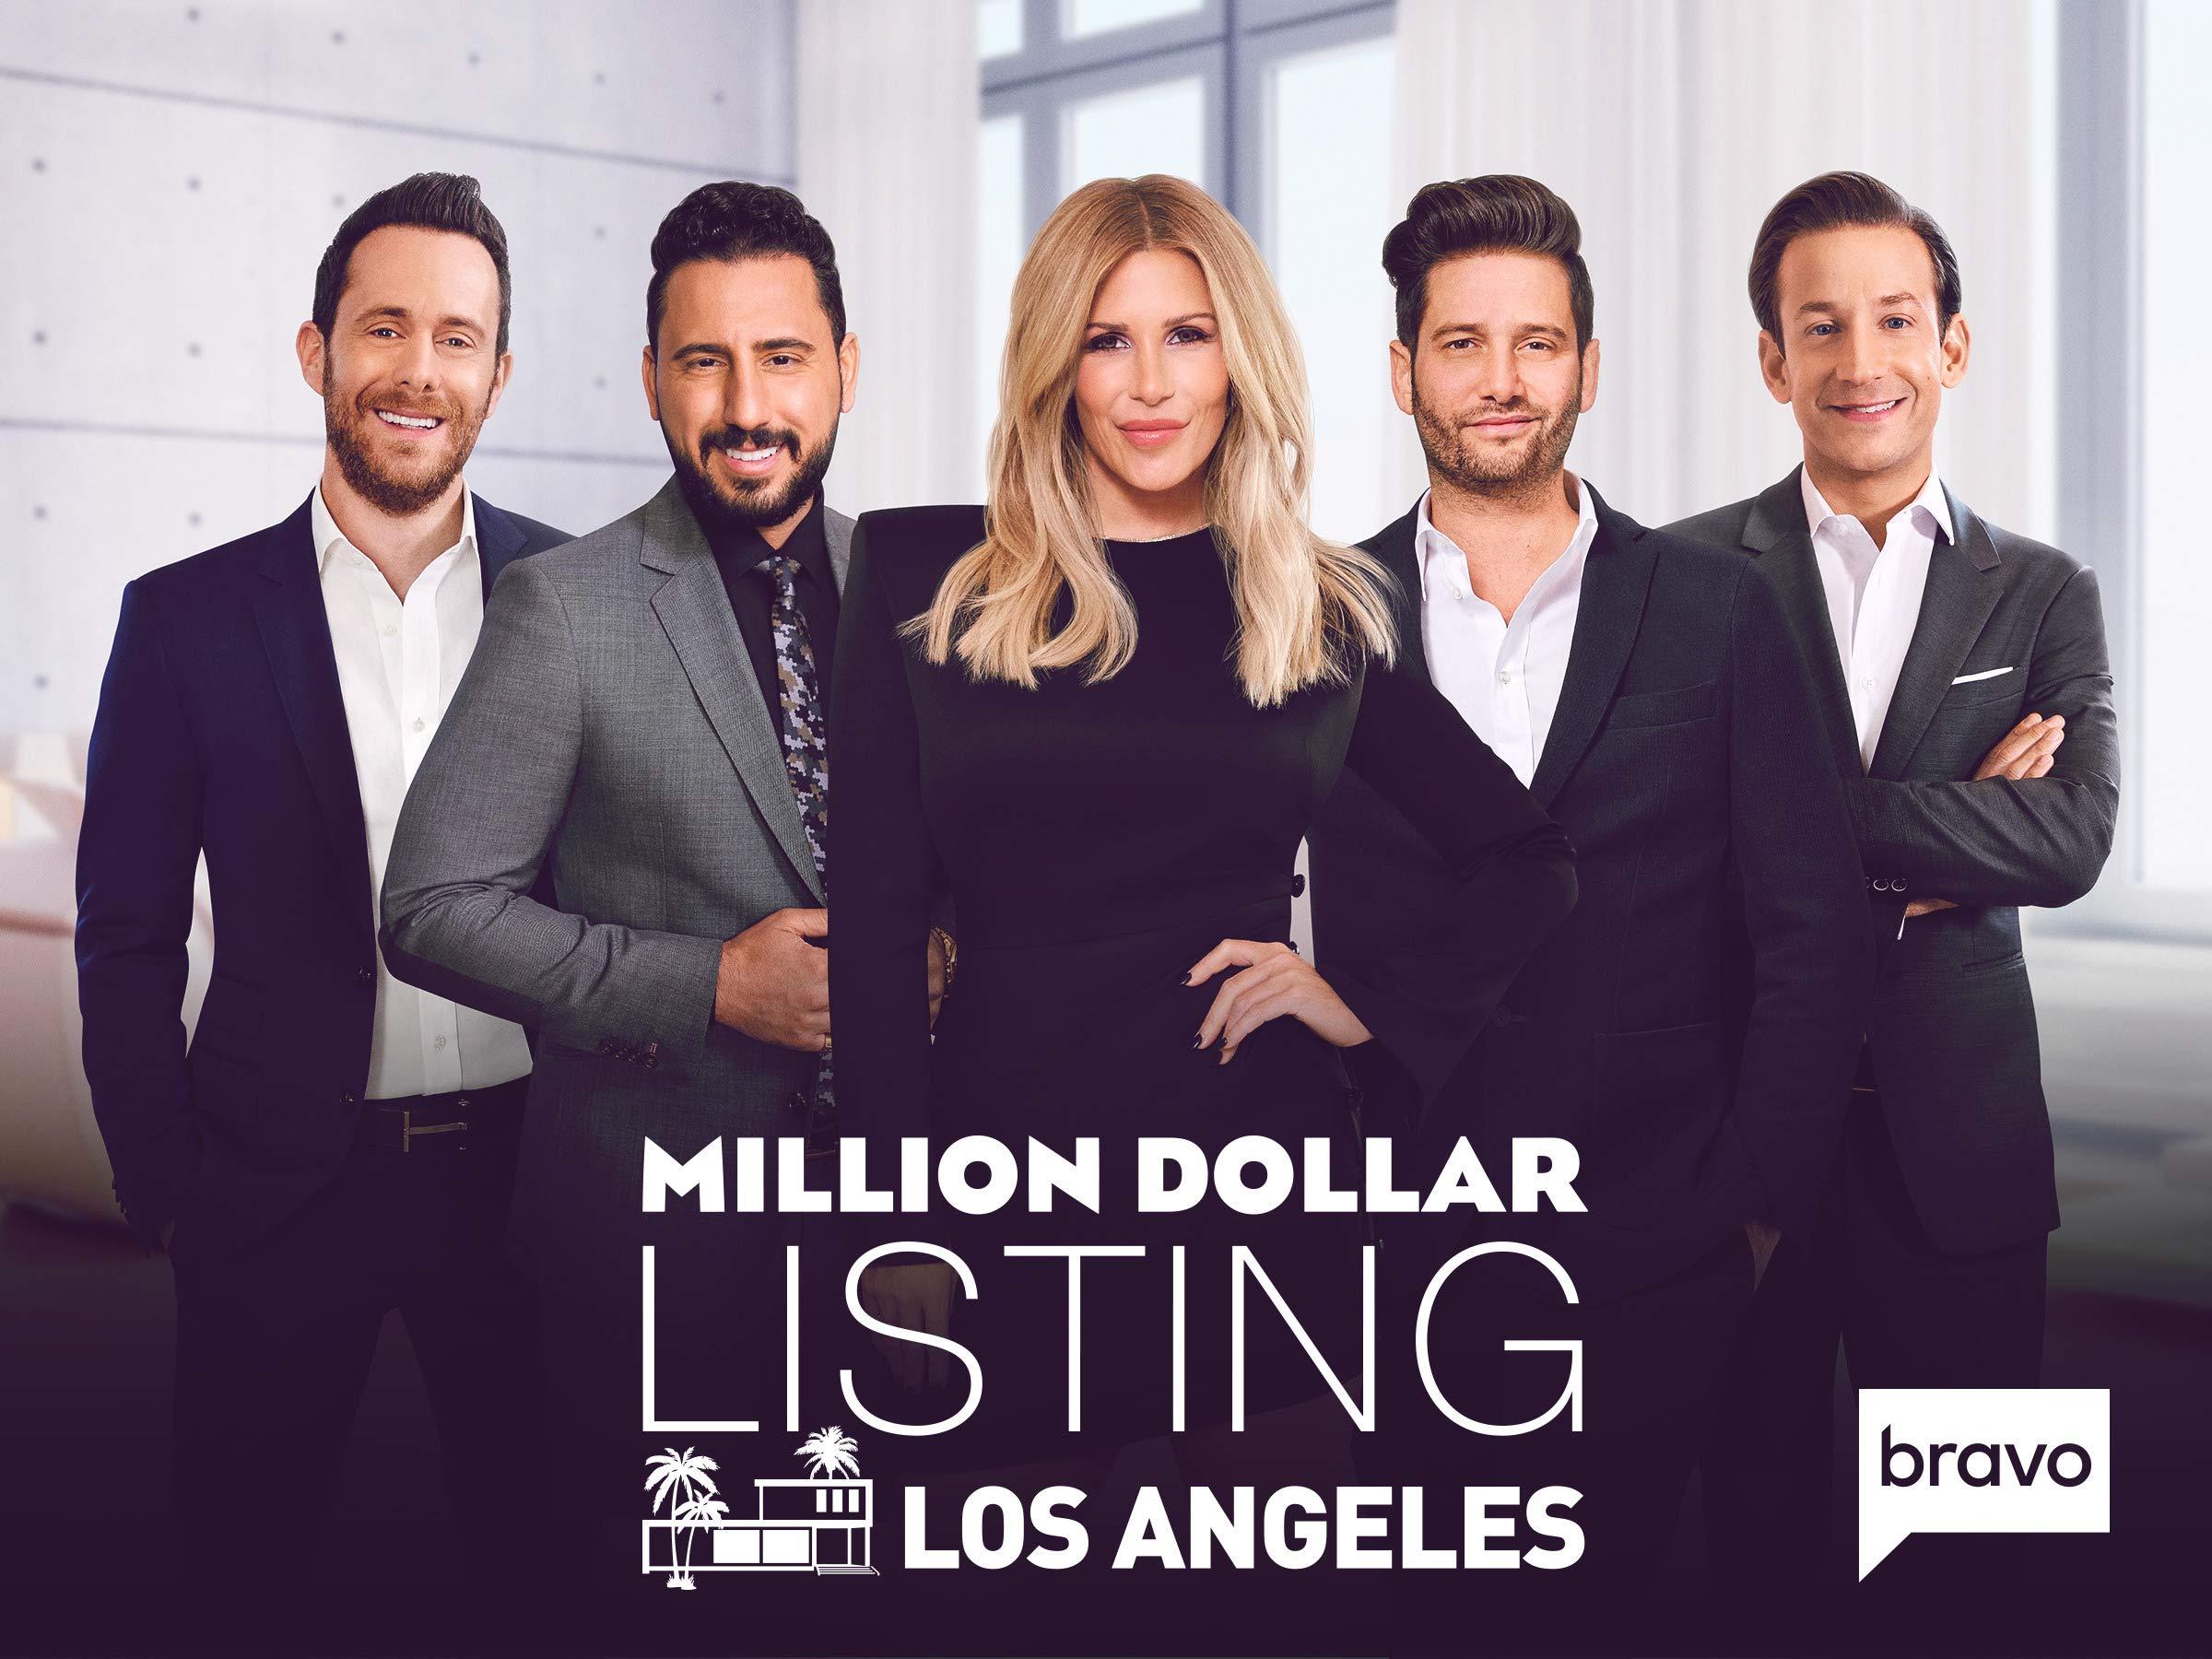 Engagement ring dollar listing million Ryan Serhant's